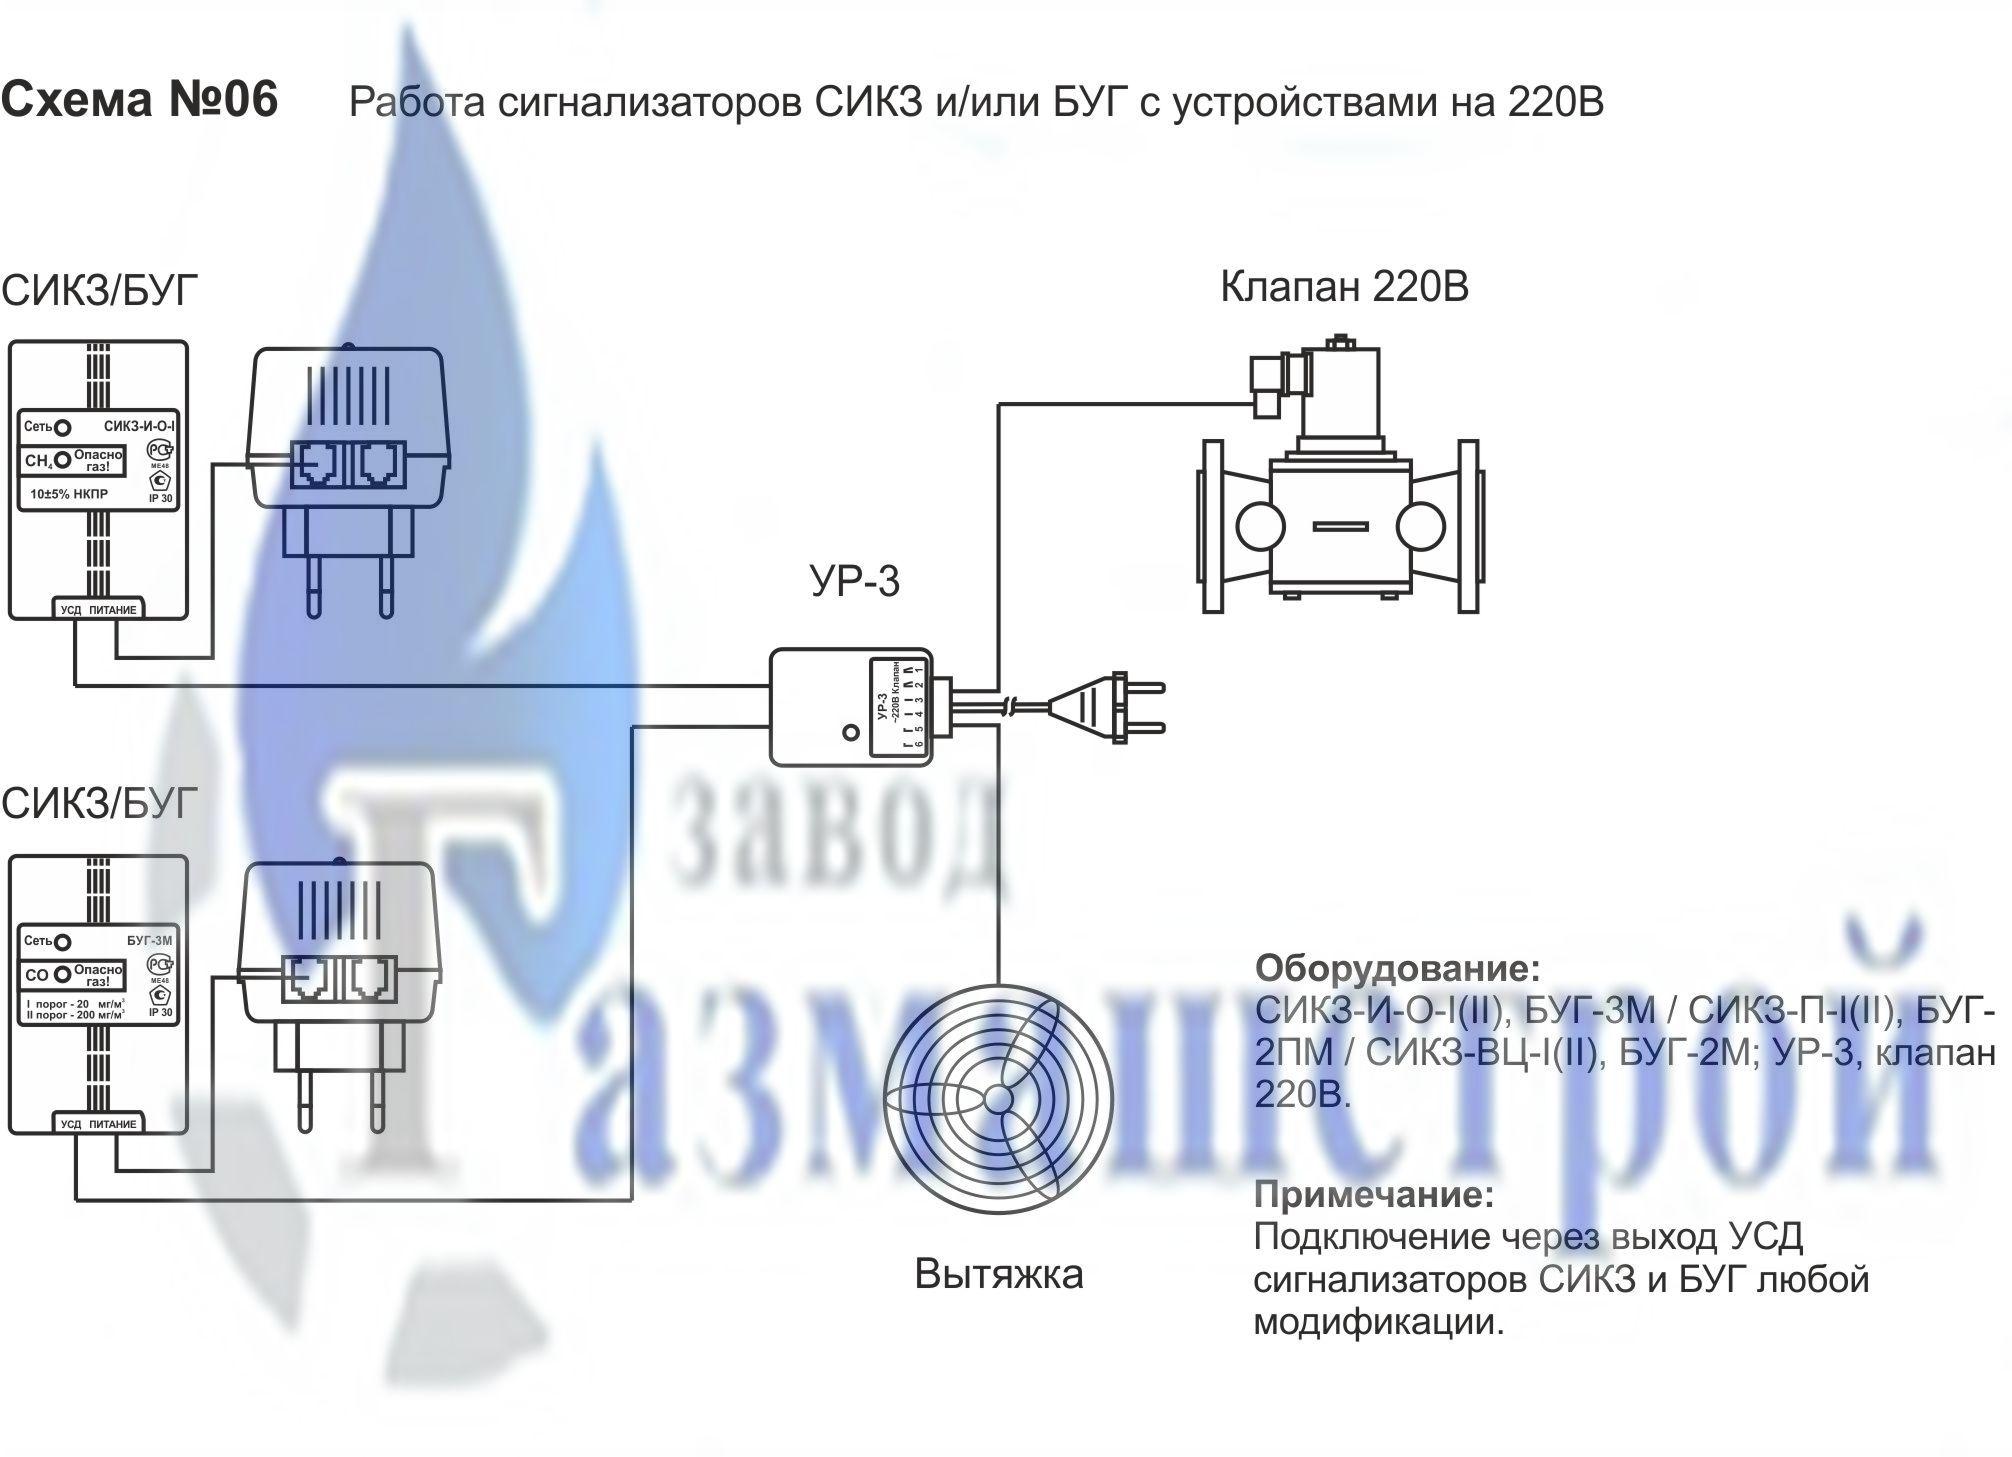 Буг сигнализатор схема